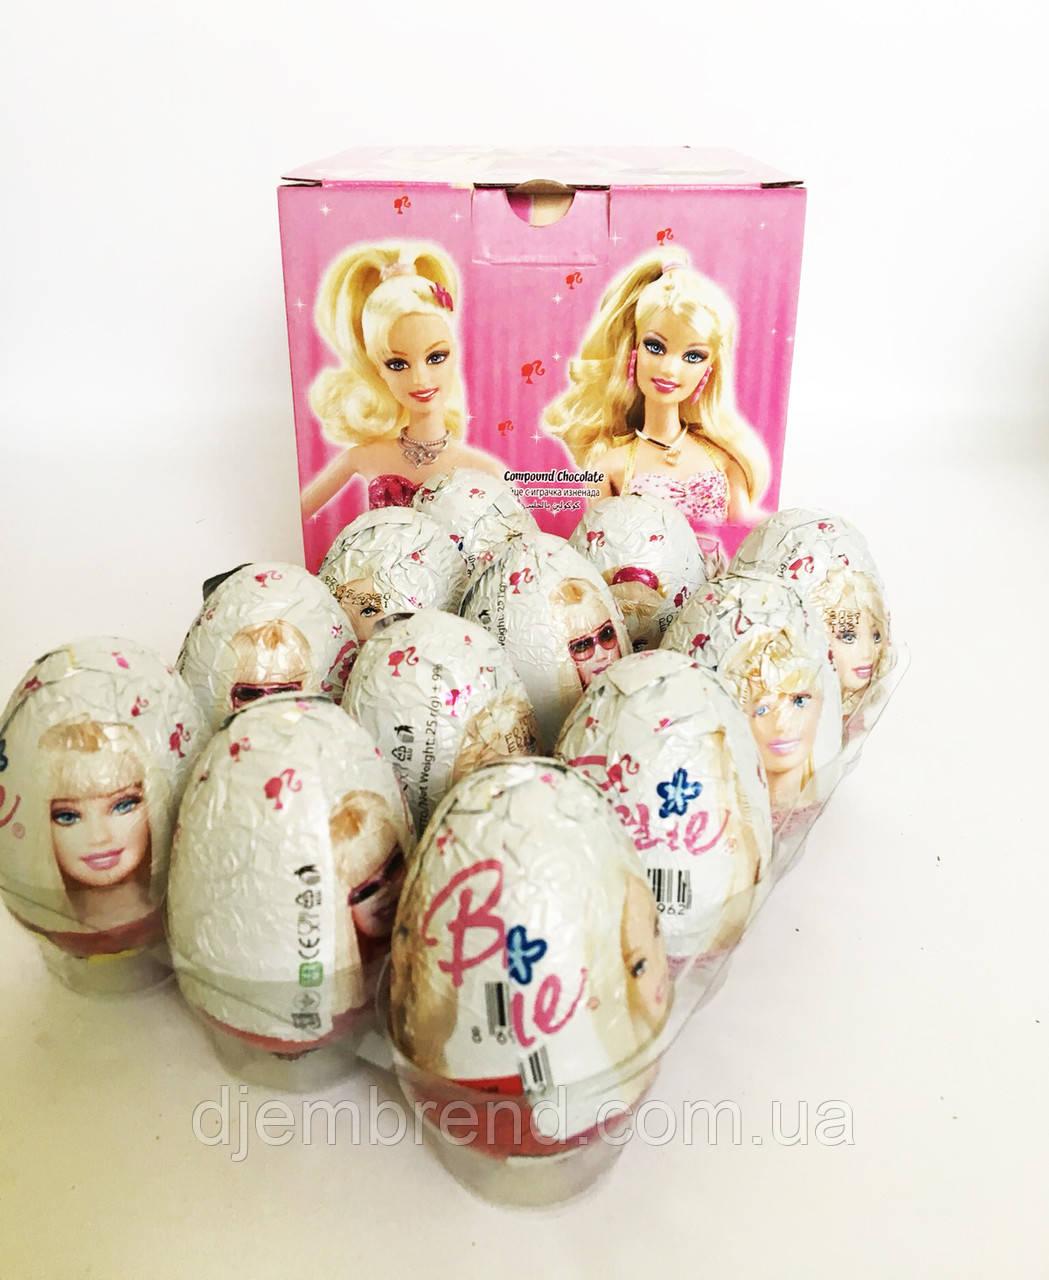 Яйцо шоколадное Барби 25 г 24 шт (ANL) Турция